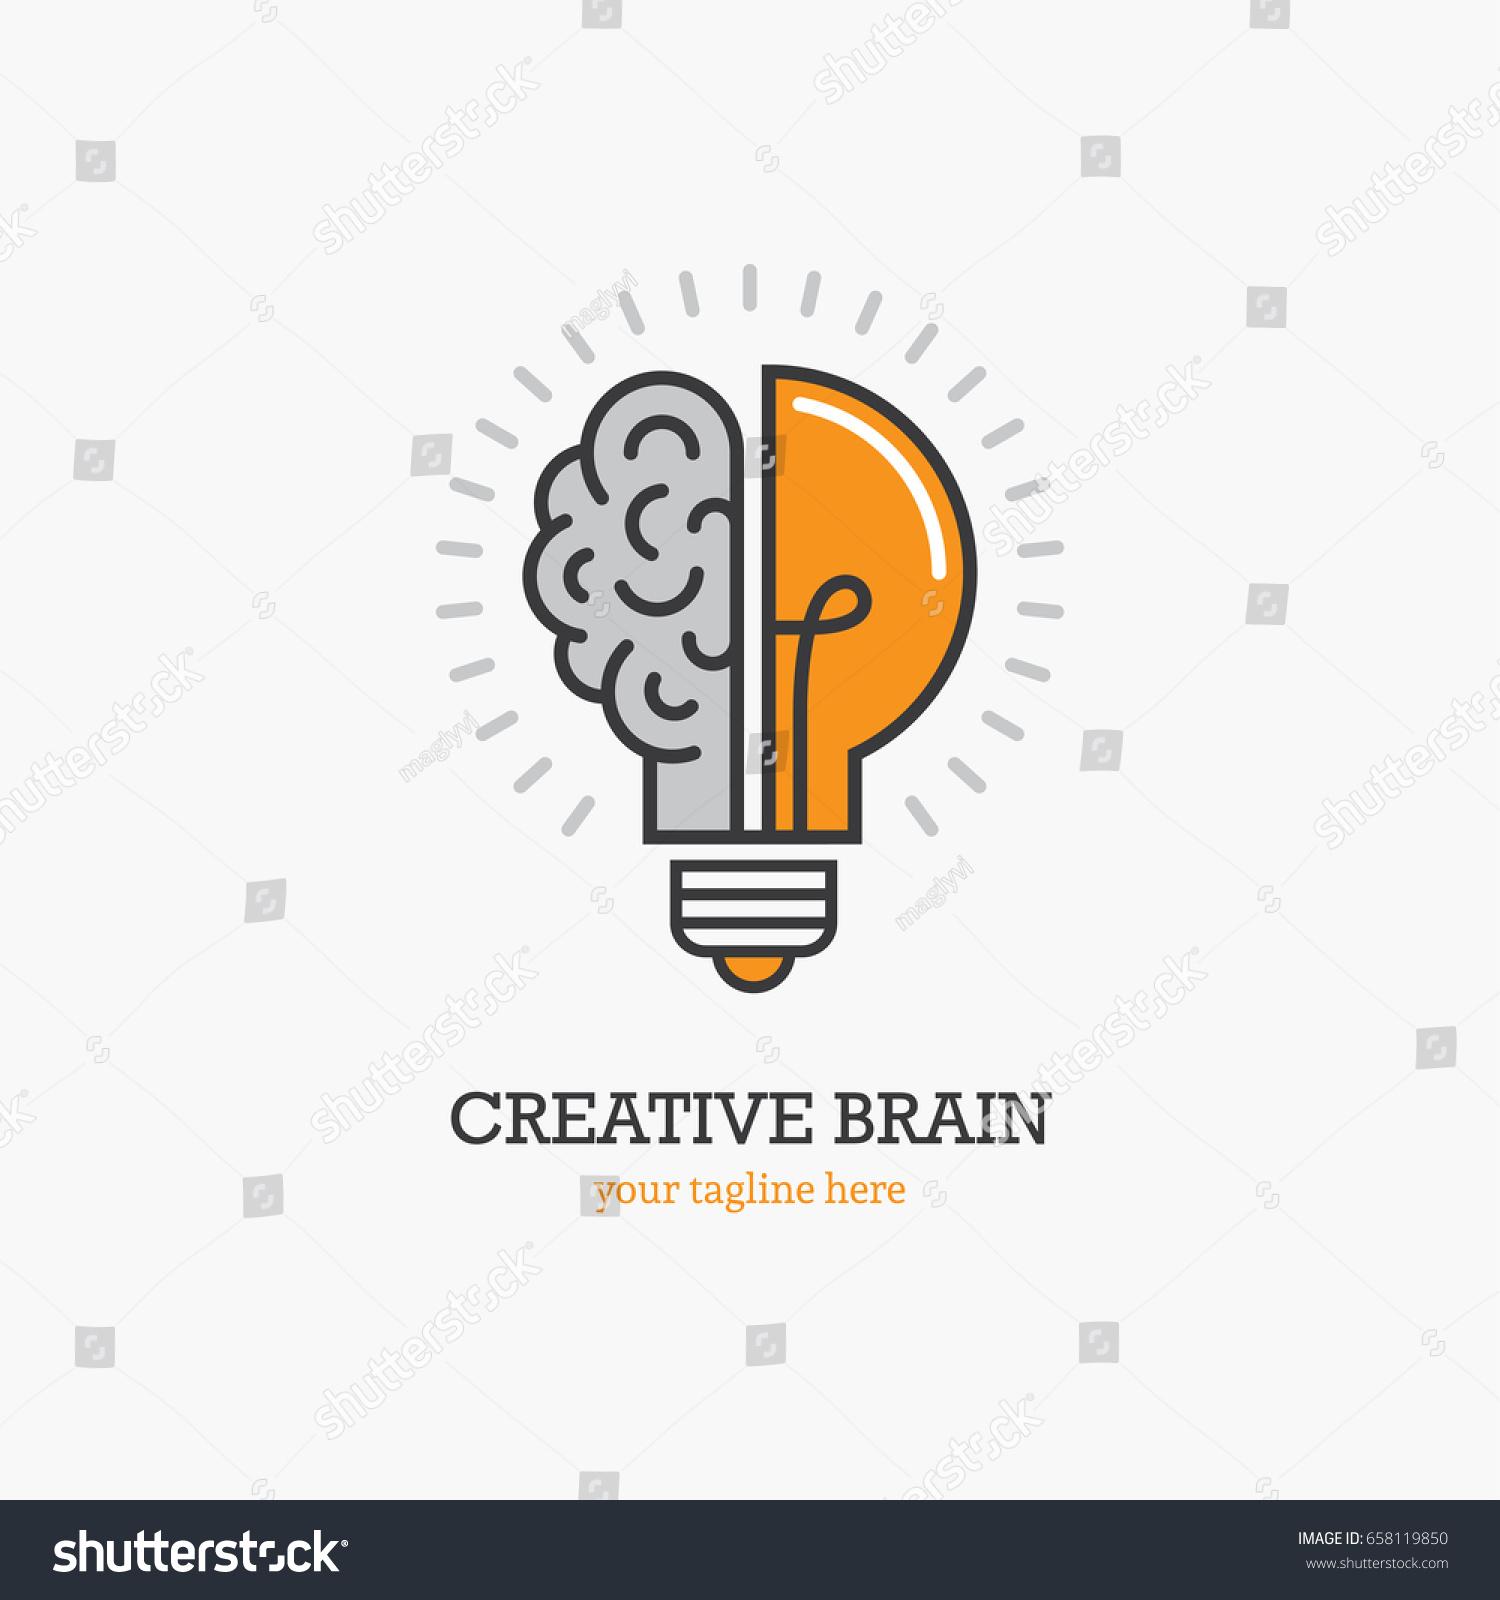 LANGUAGES Creativity and Innovation